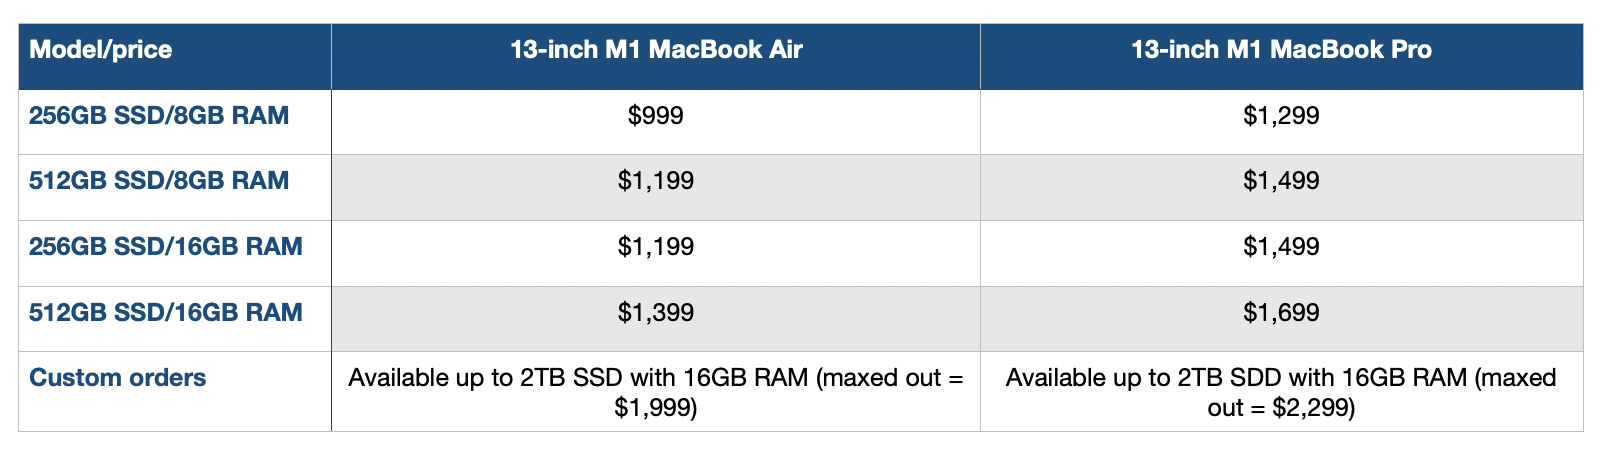 M1 MacBook Air vs Pro price comparison